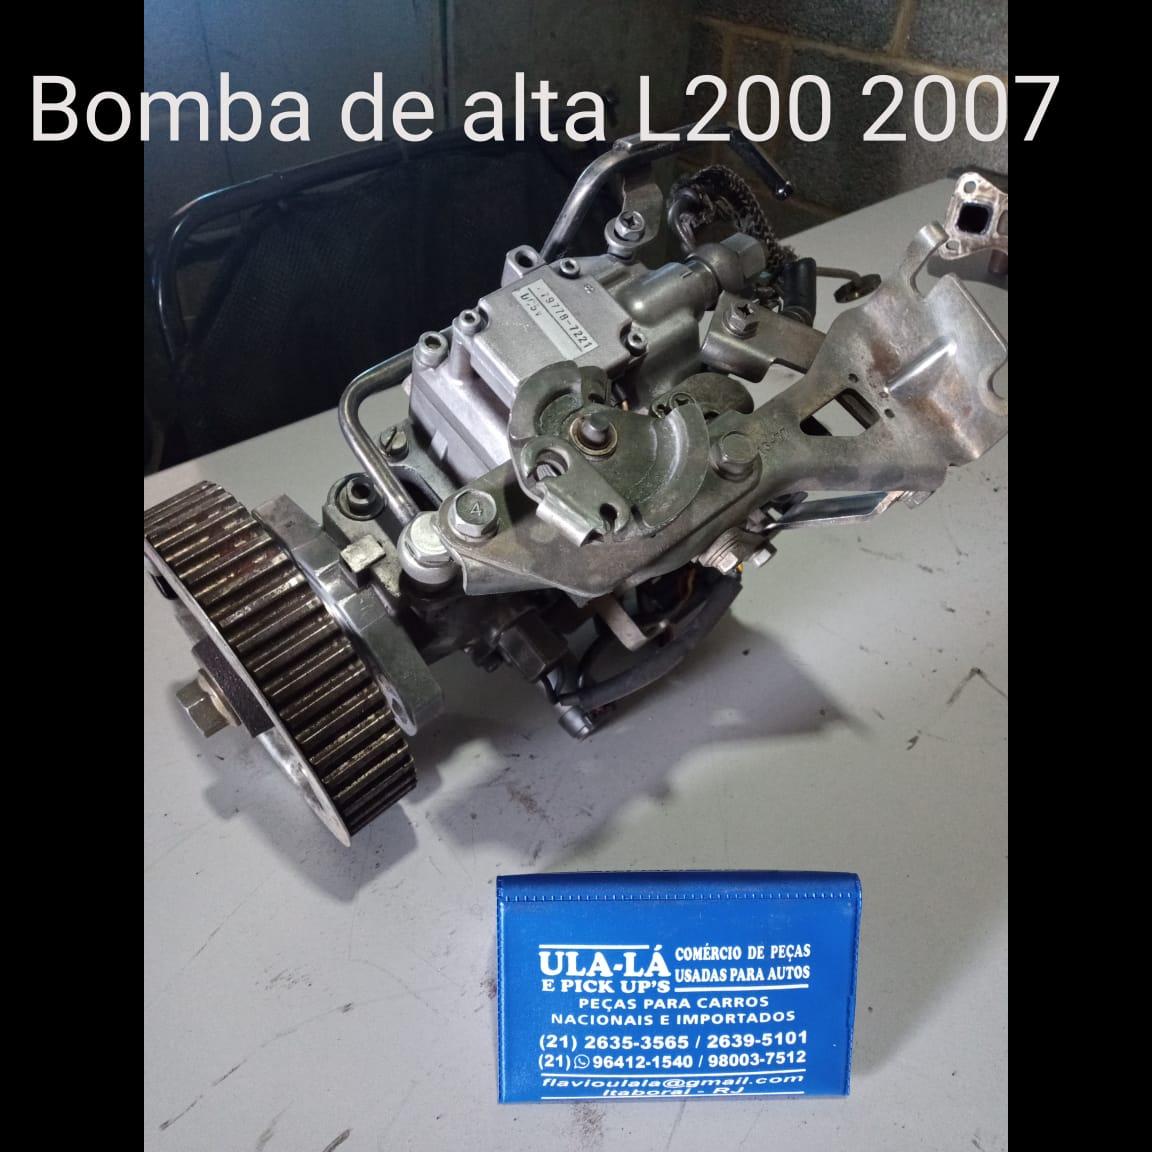 FERRO VELHO EM MANILHA ITABORAI - ULA LÁ - RJ